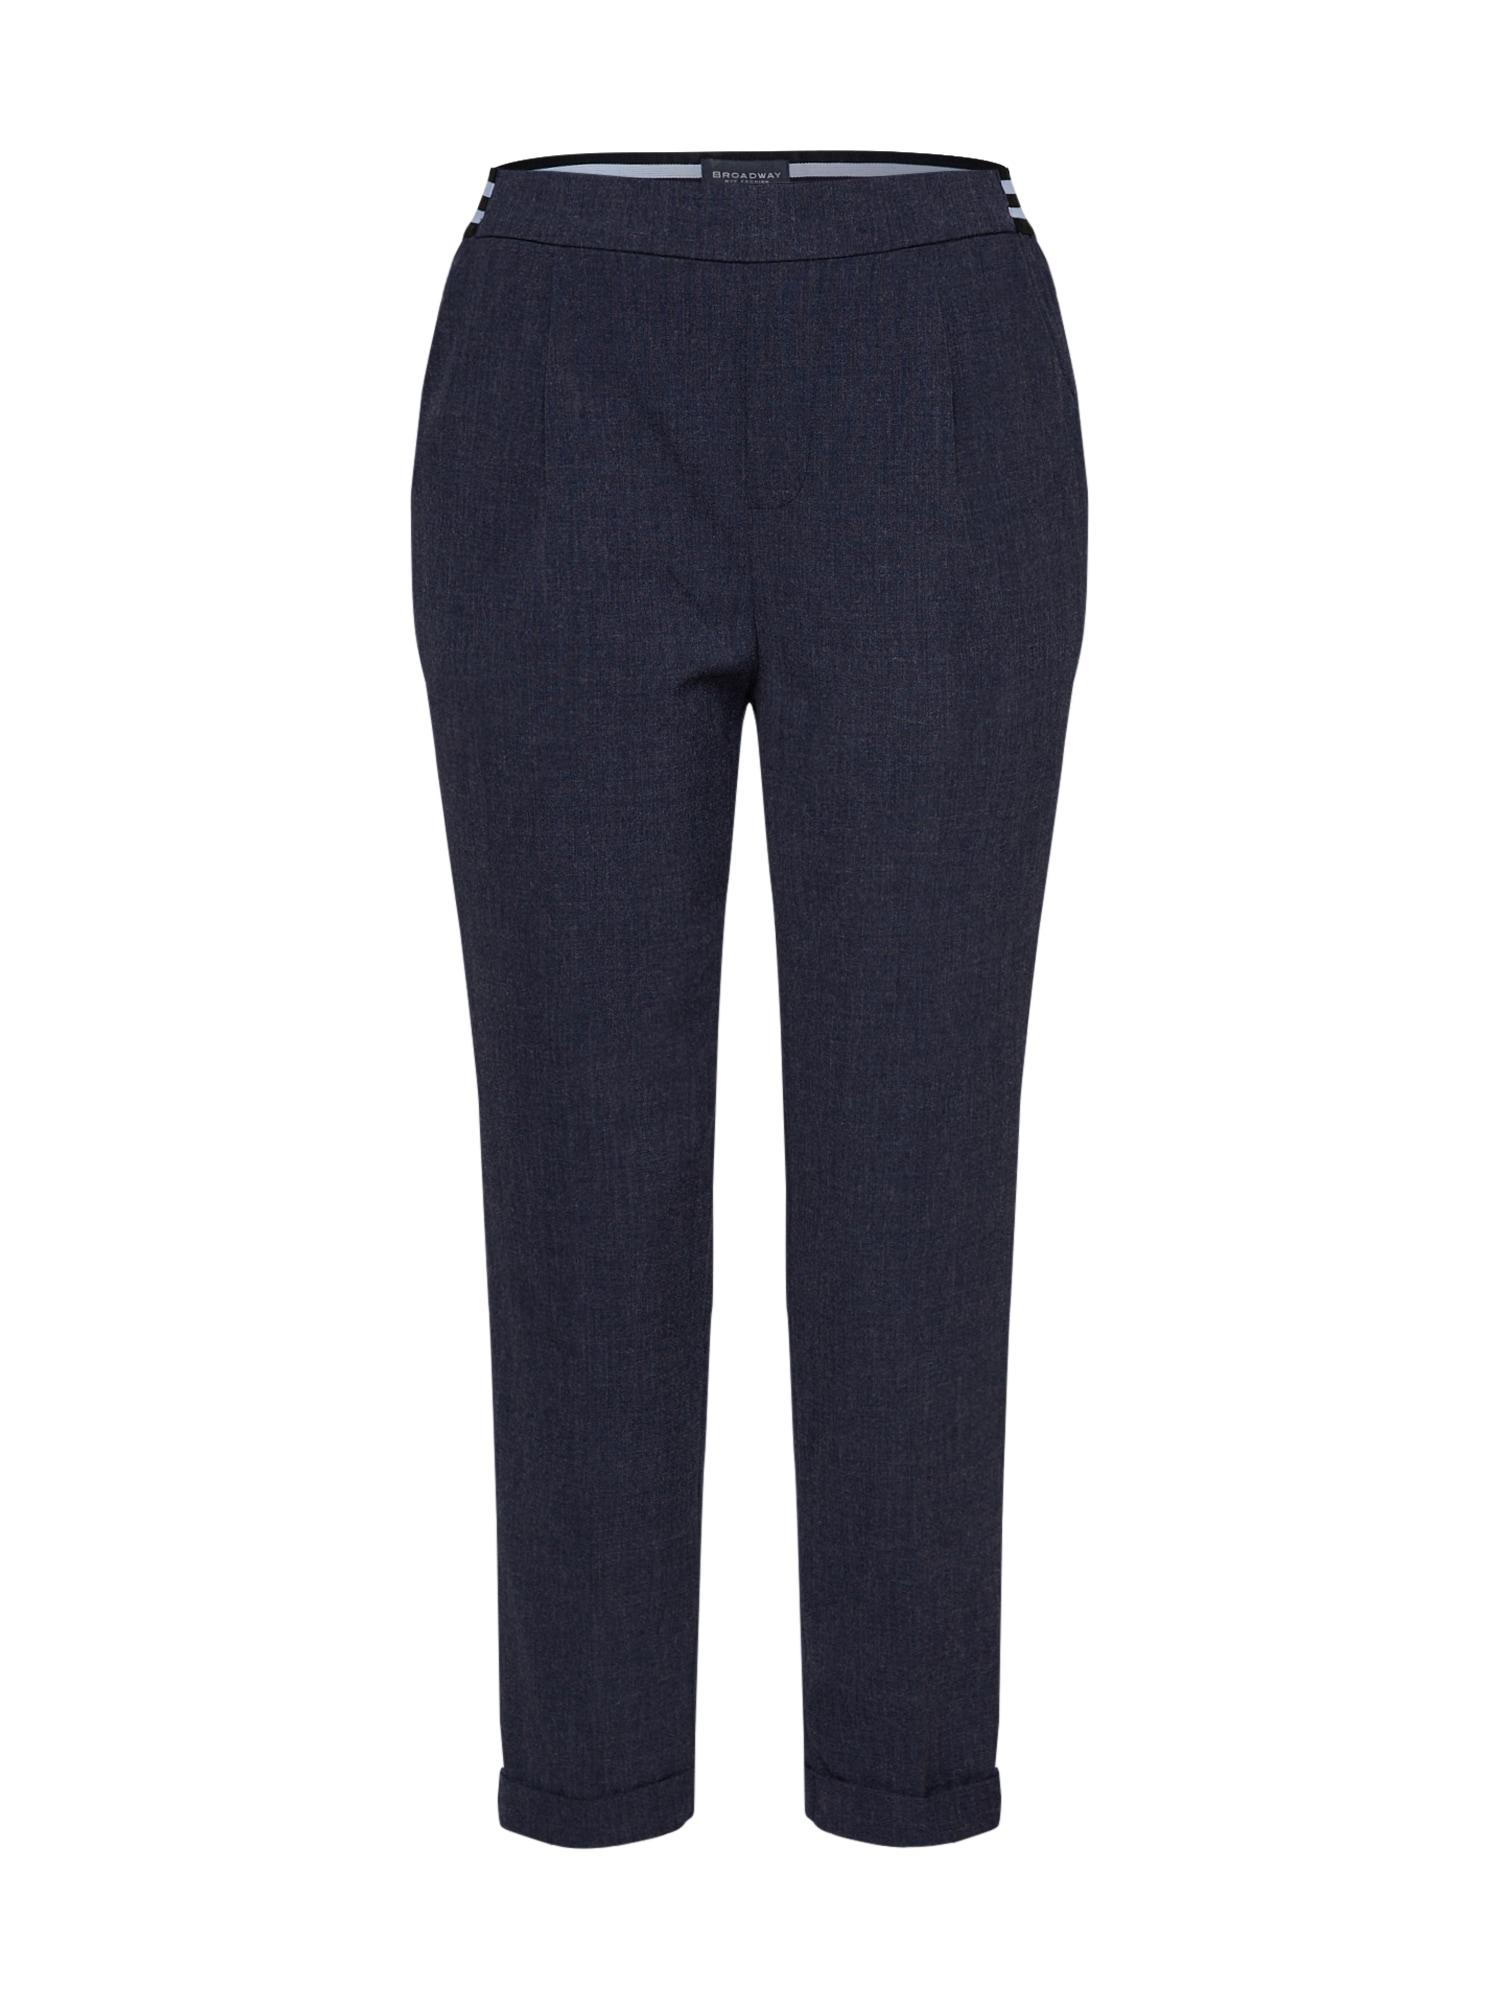 Kalhoty se sklady v pase Gabby tmavě modrá BROADWAY NYC FASHION